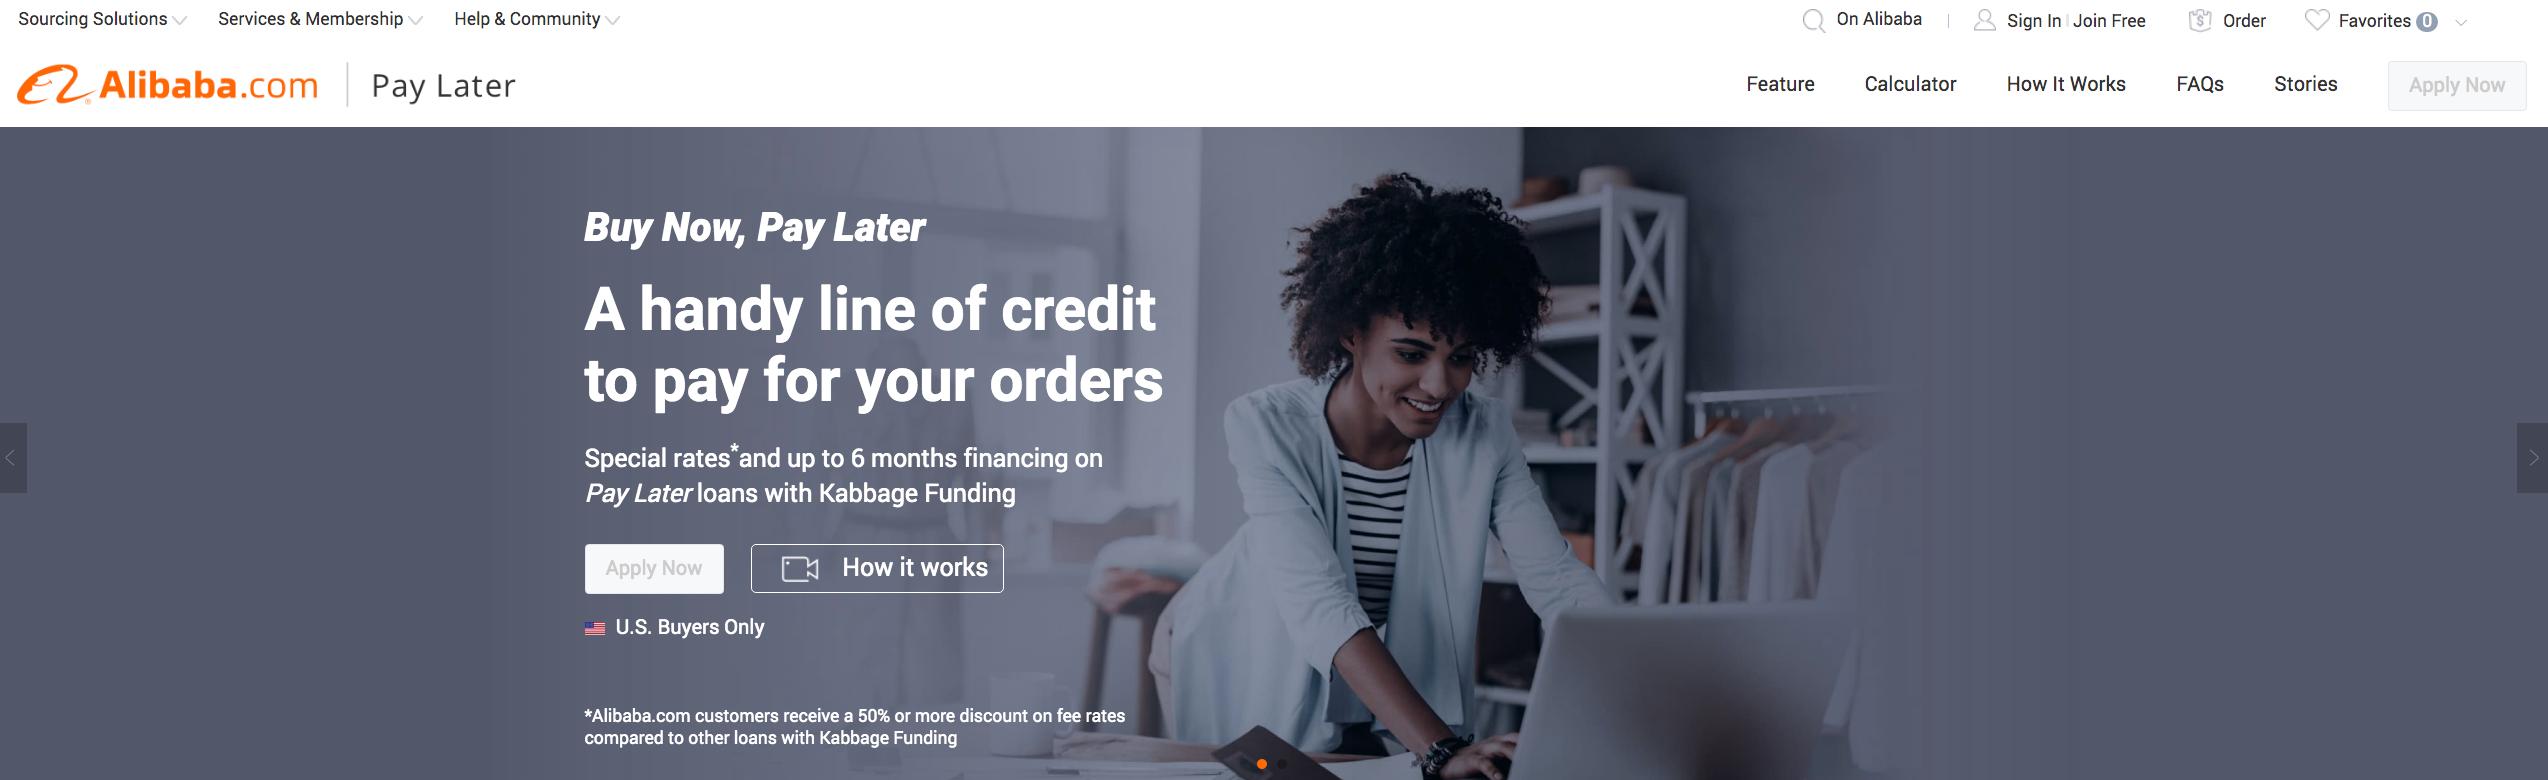 features of B2b ecommerce platform